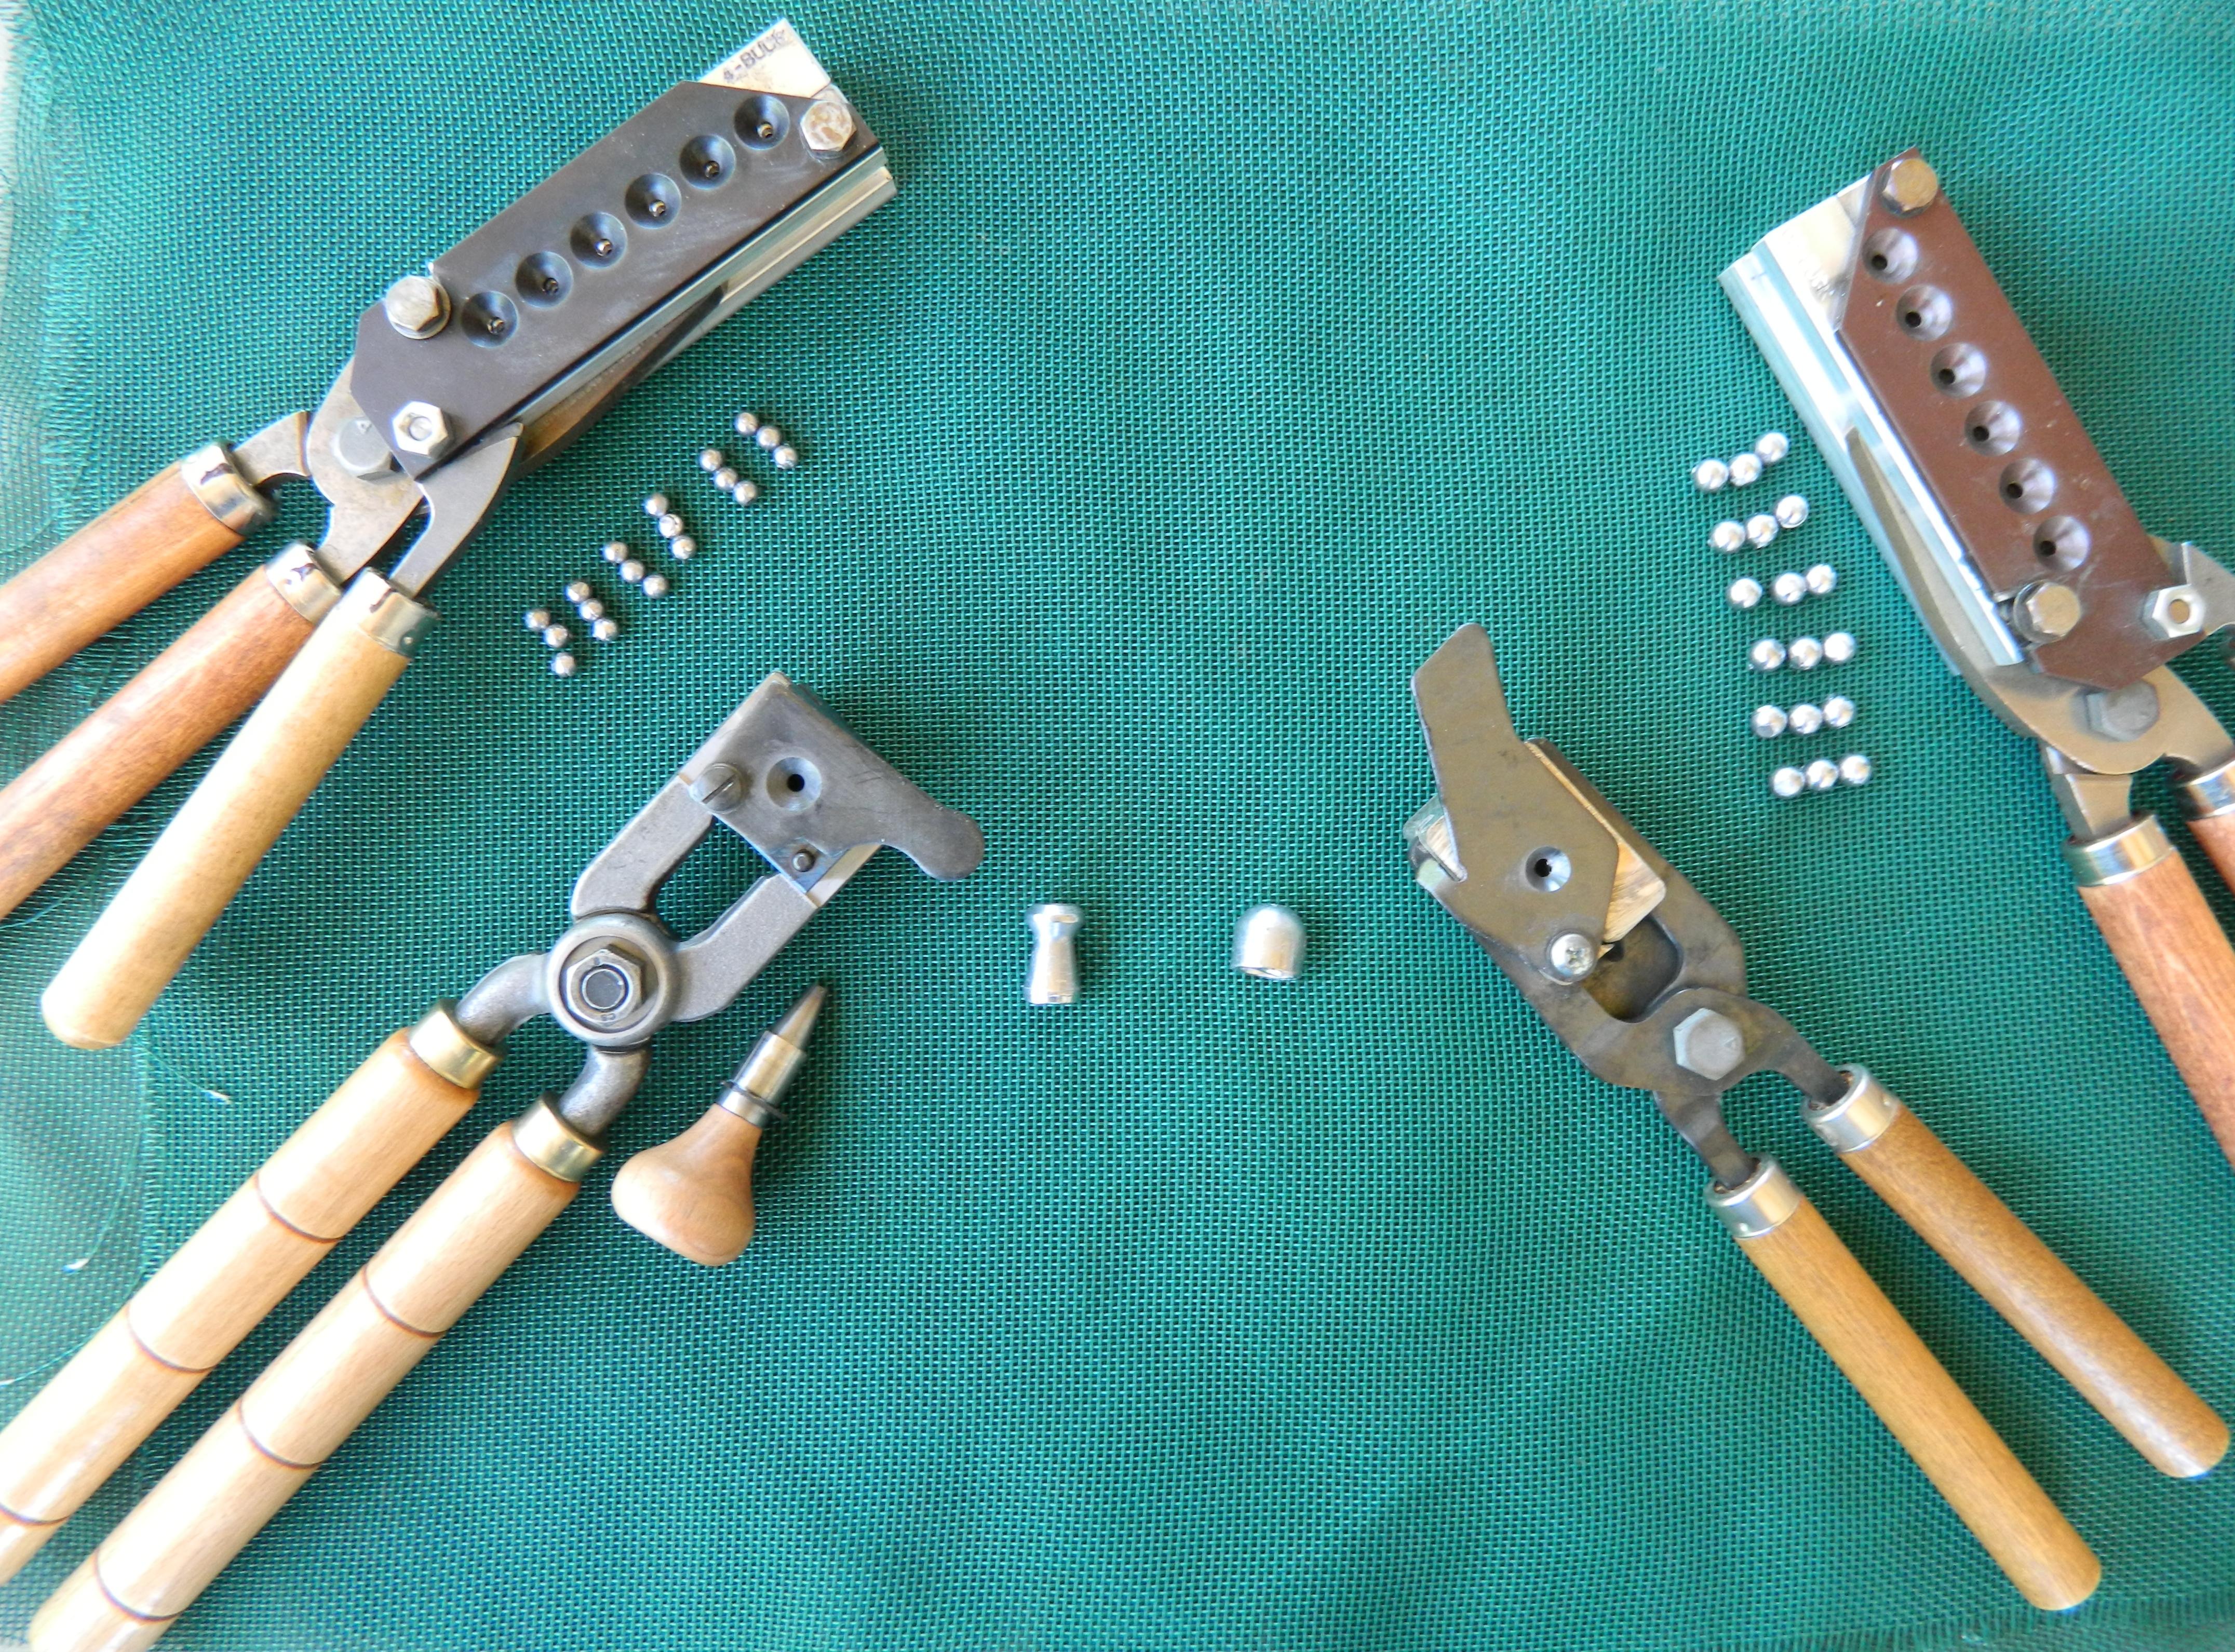 Social Shotgun Shells: Reloading Slugs and Buckshot